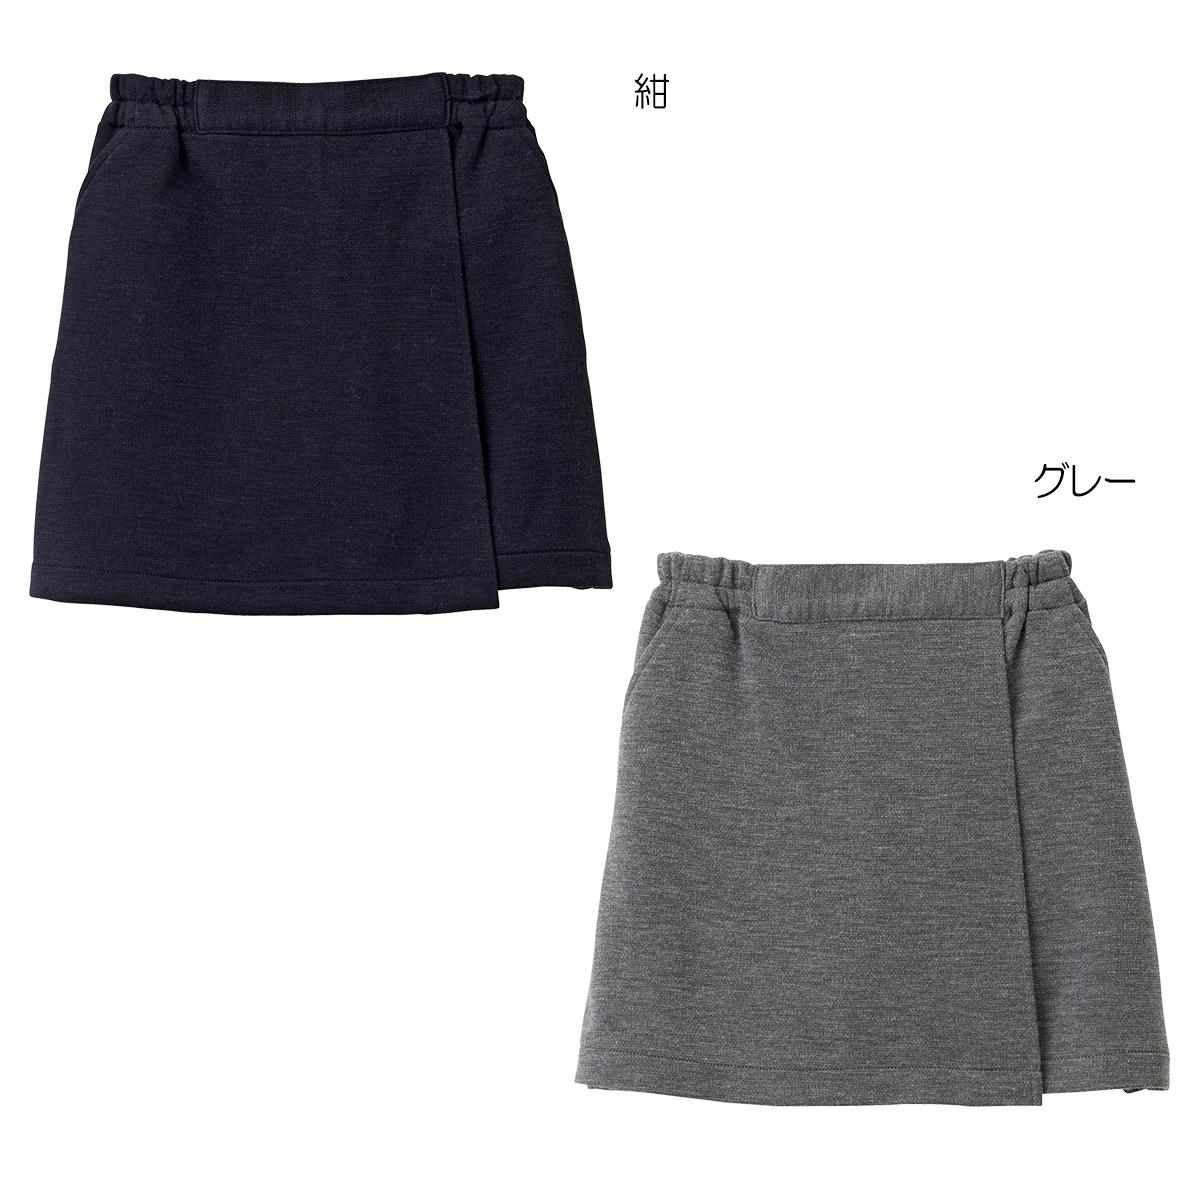 [mikihouse][ミキハウス]【面接】巻きスカート風キュロットスカート(120cm・130cm)